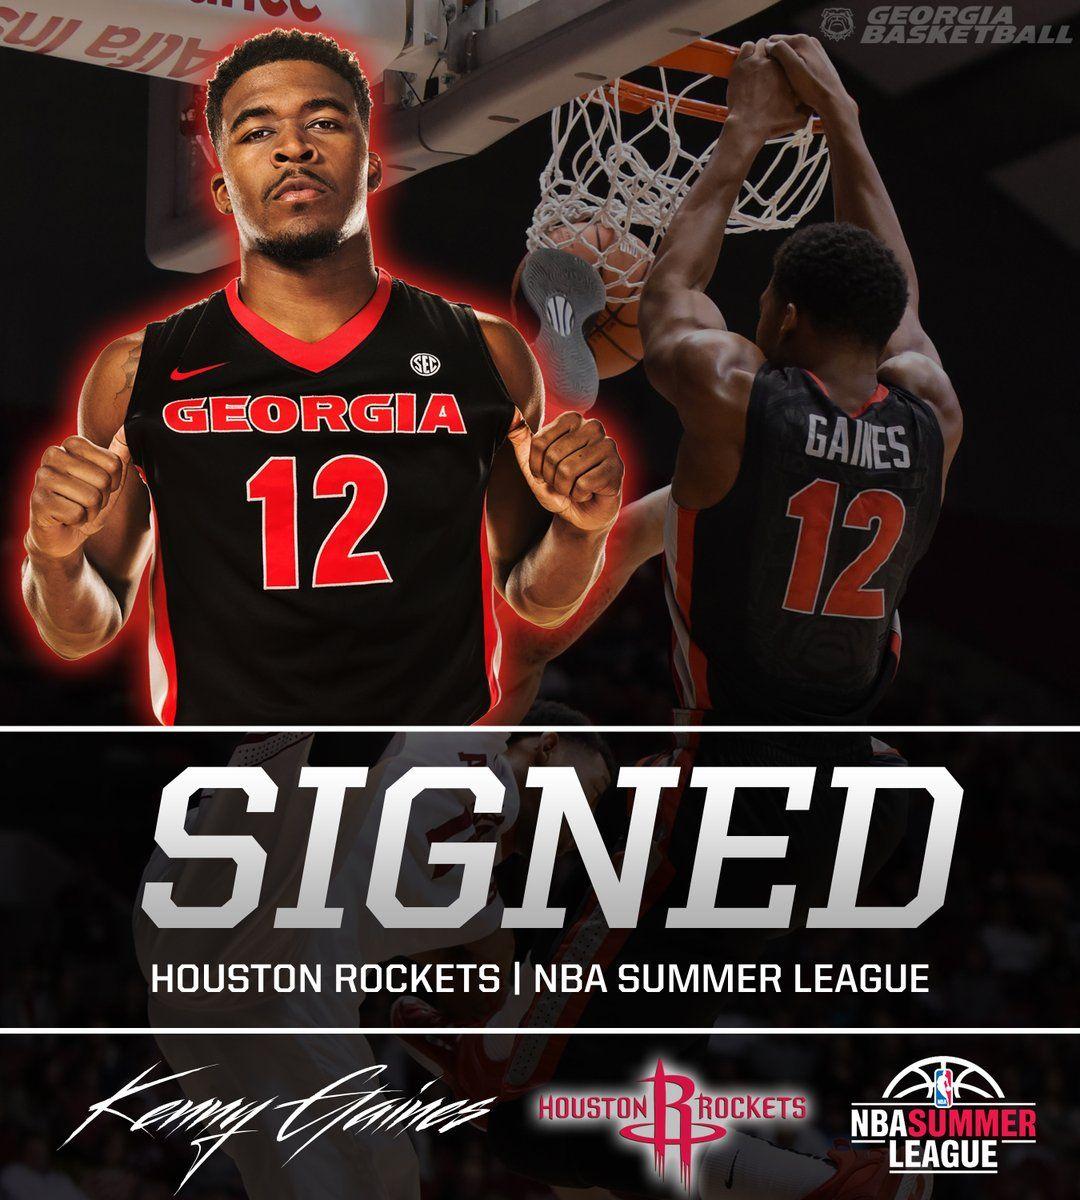 Bulldogs College Basketball News, Scores